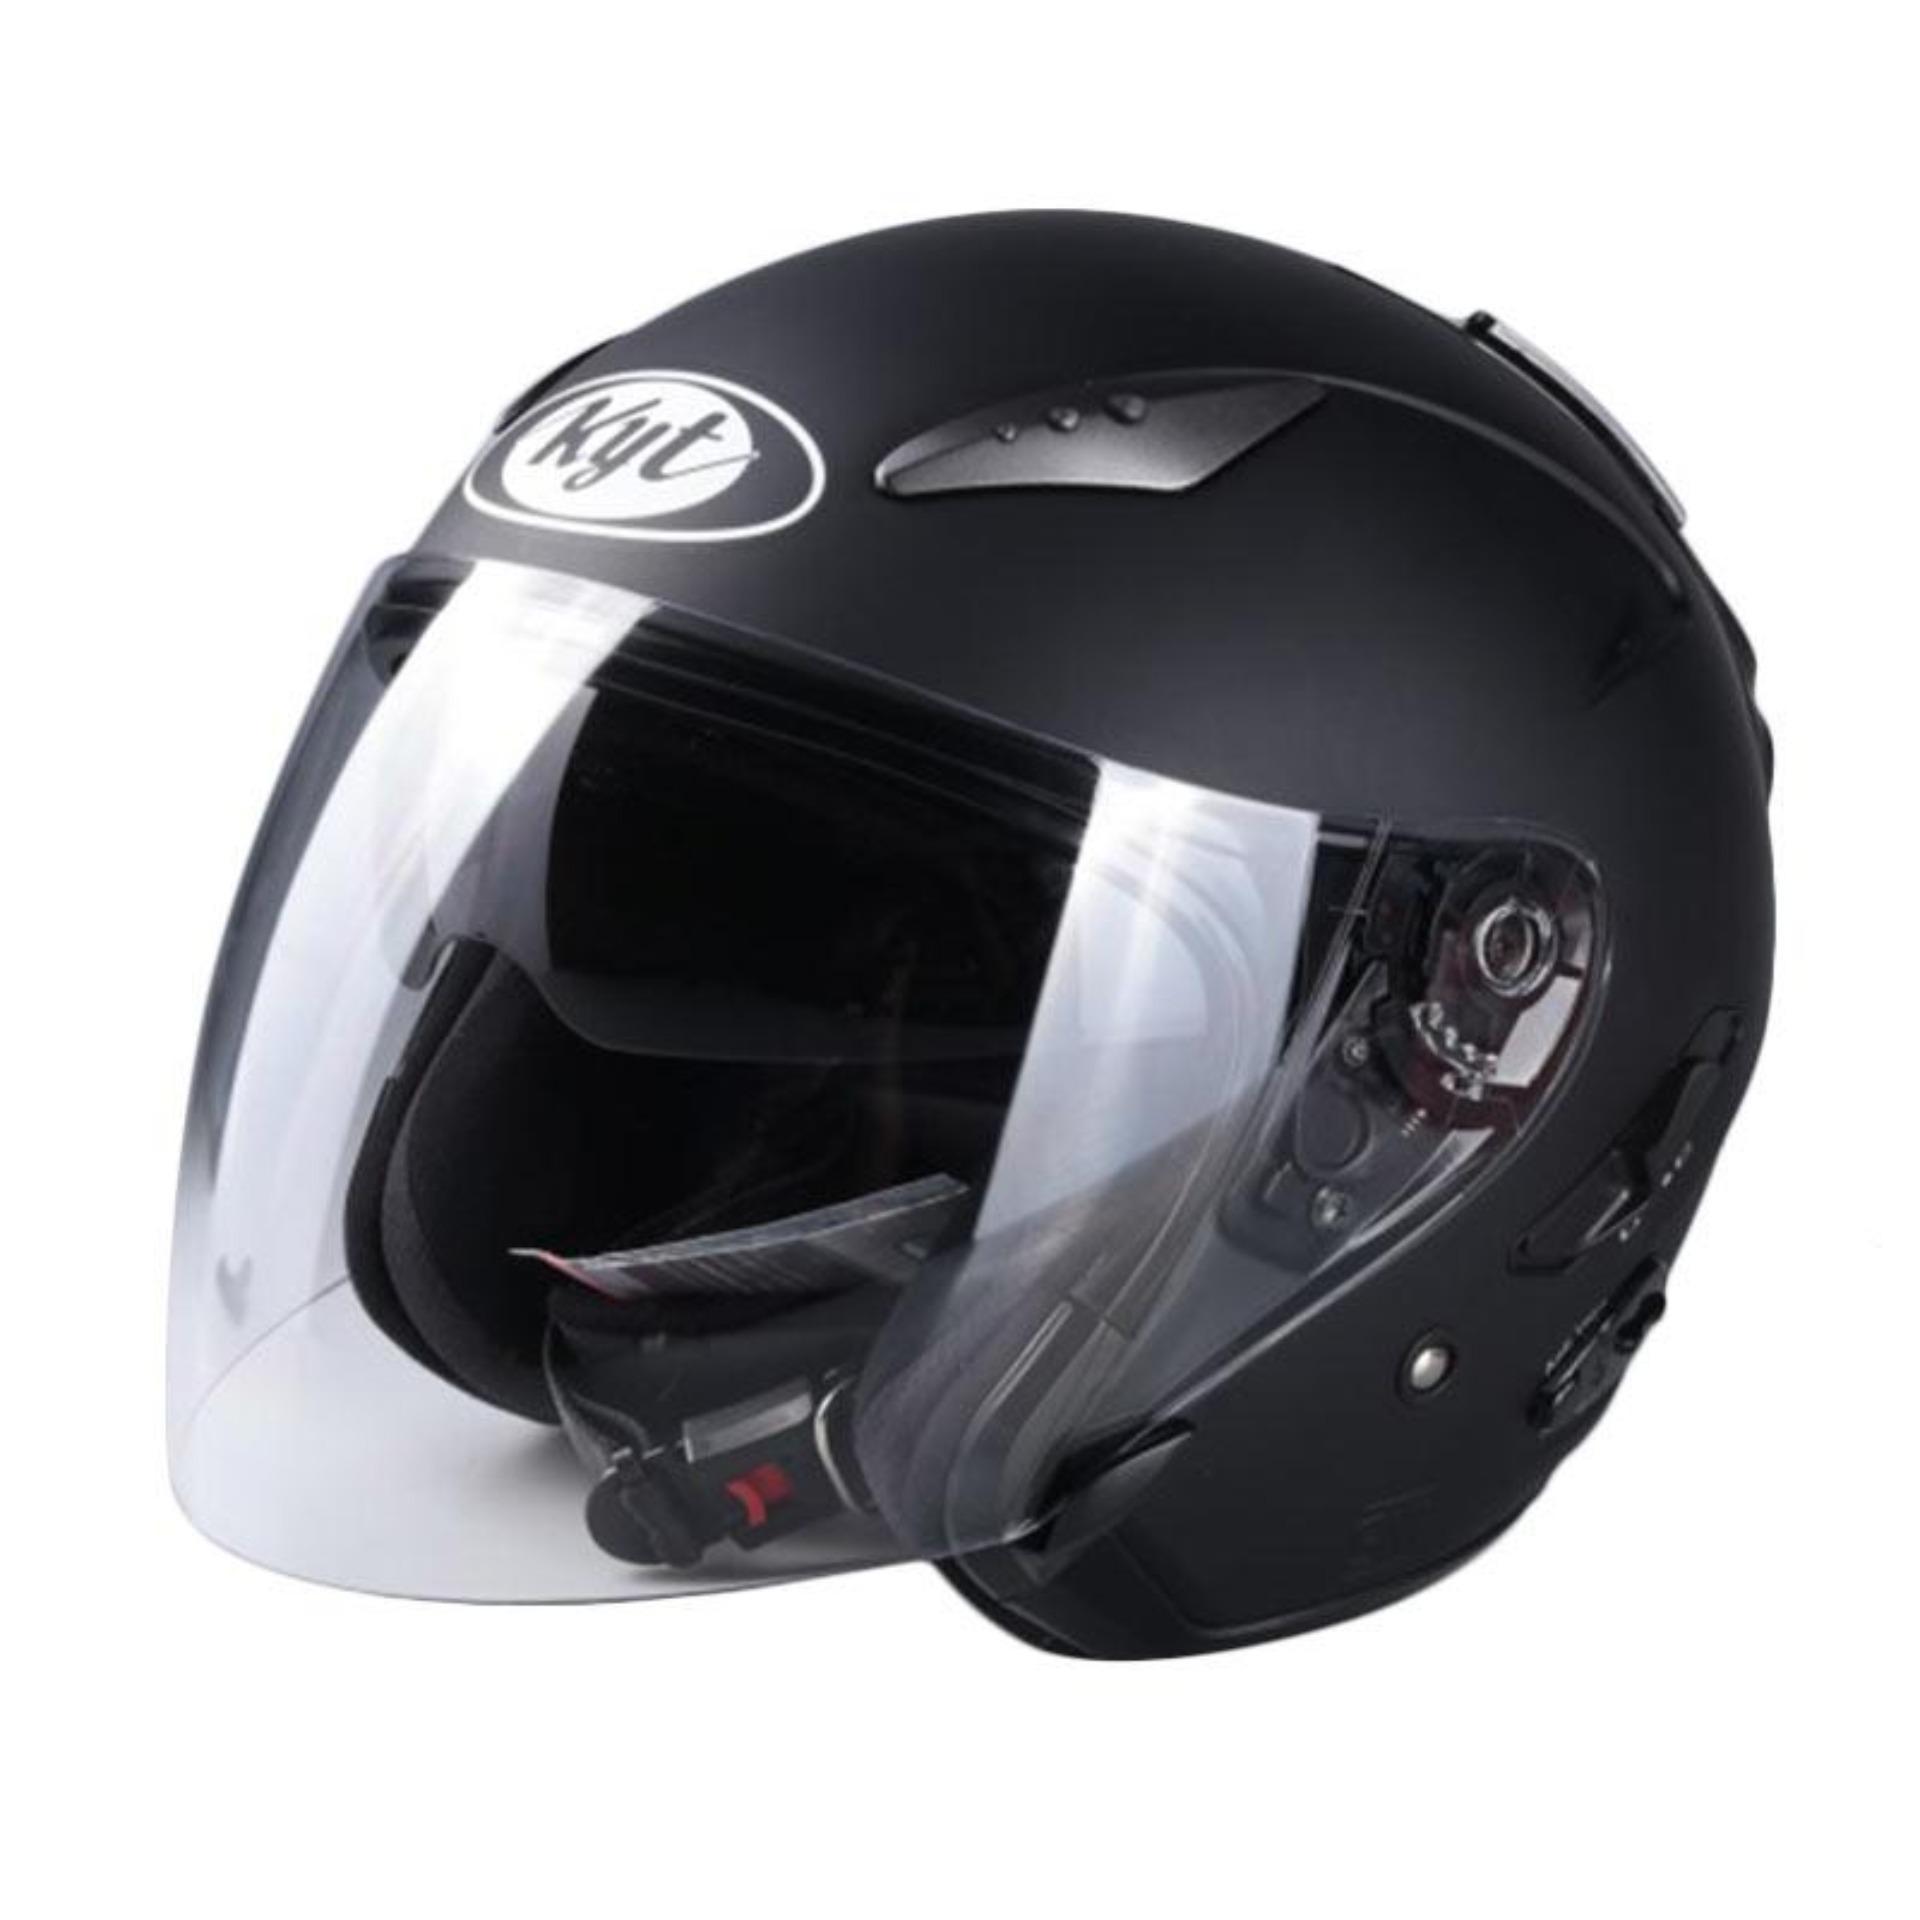 KYT Galaxy Helm Half Face - Black Doff